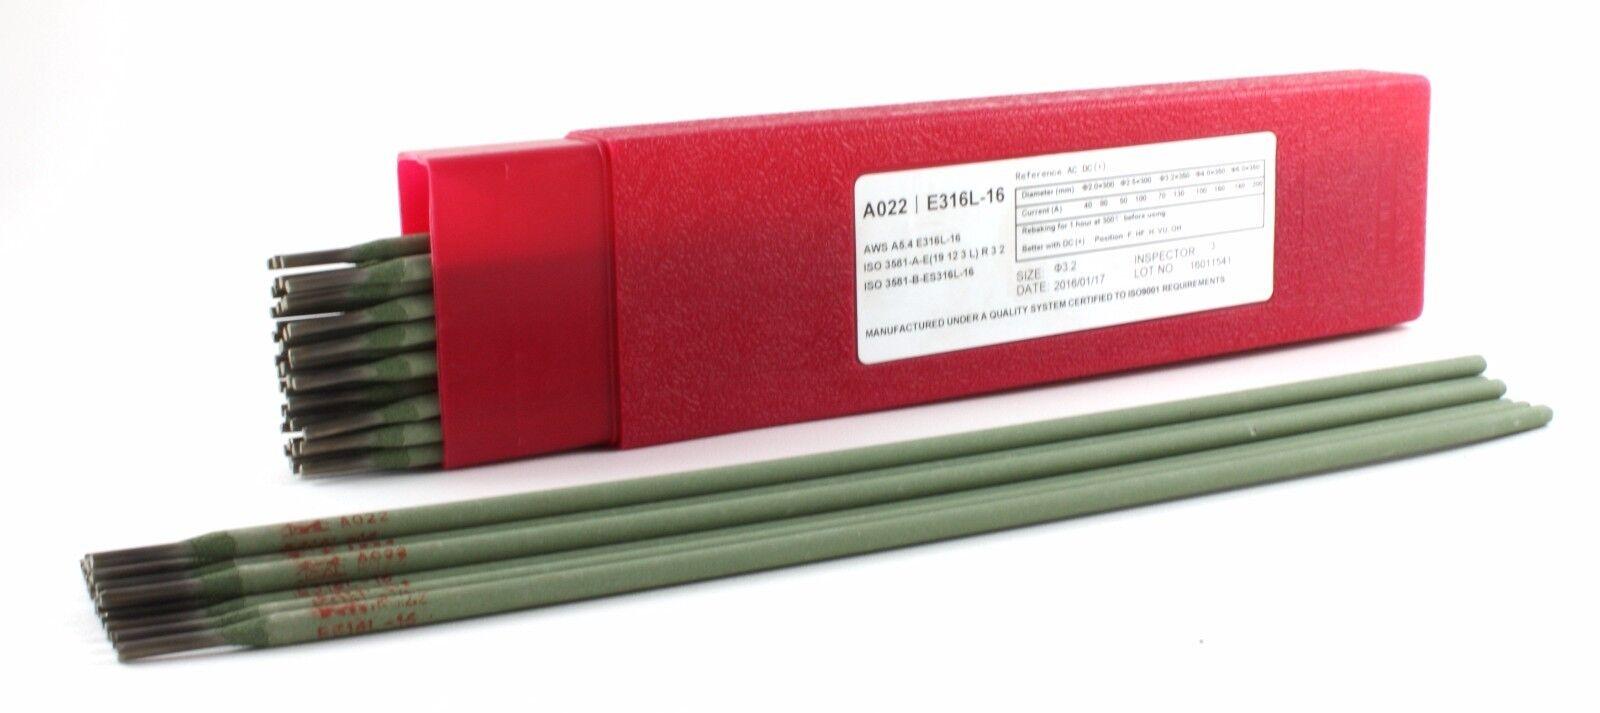 20* For DYMO Rhino 3000//6000 Heat-Shrink Tube 18051 Industry Label Tape 6mm*1.5m